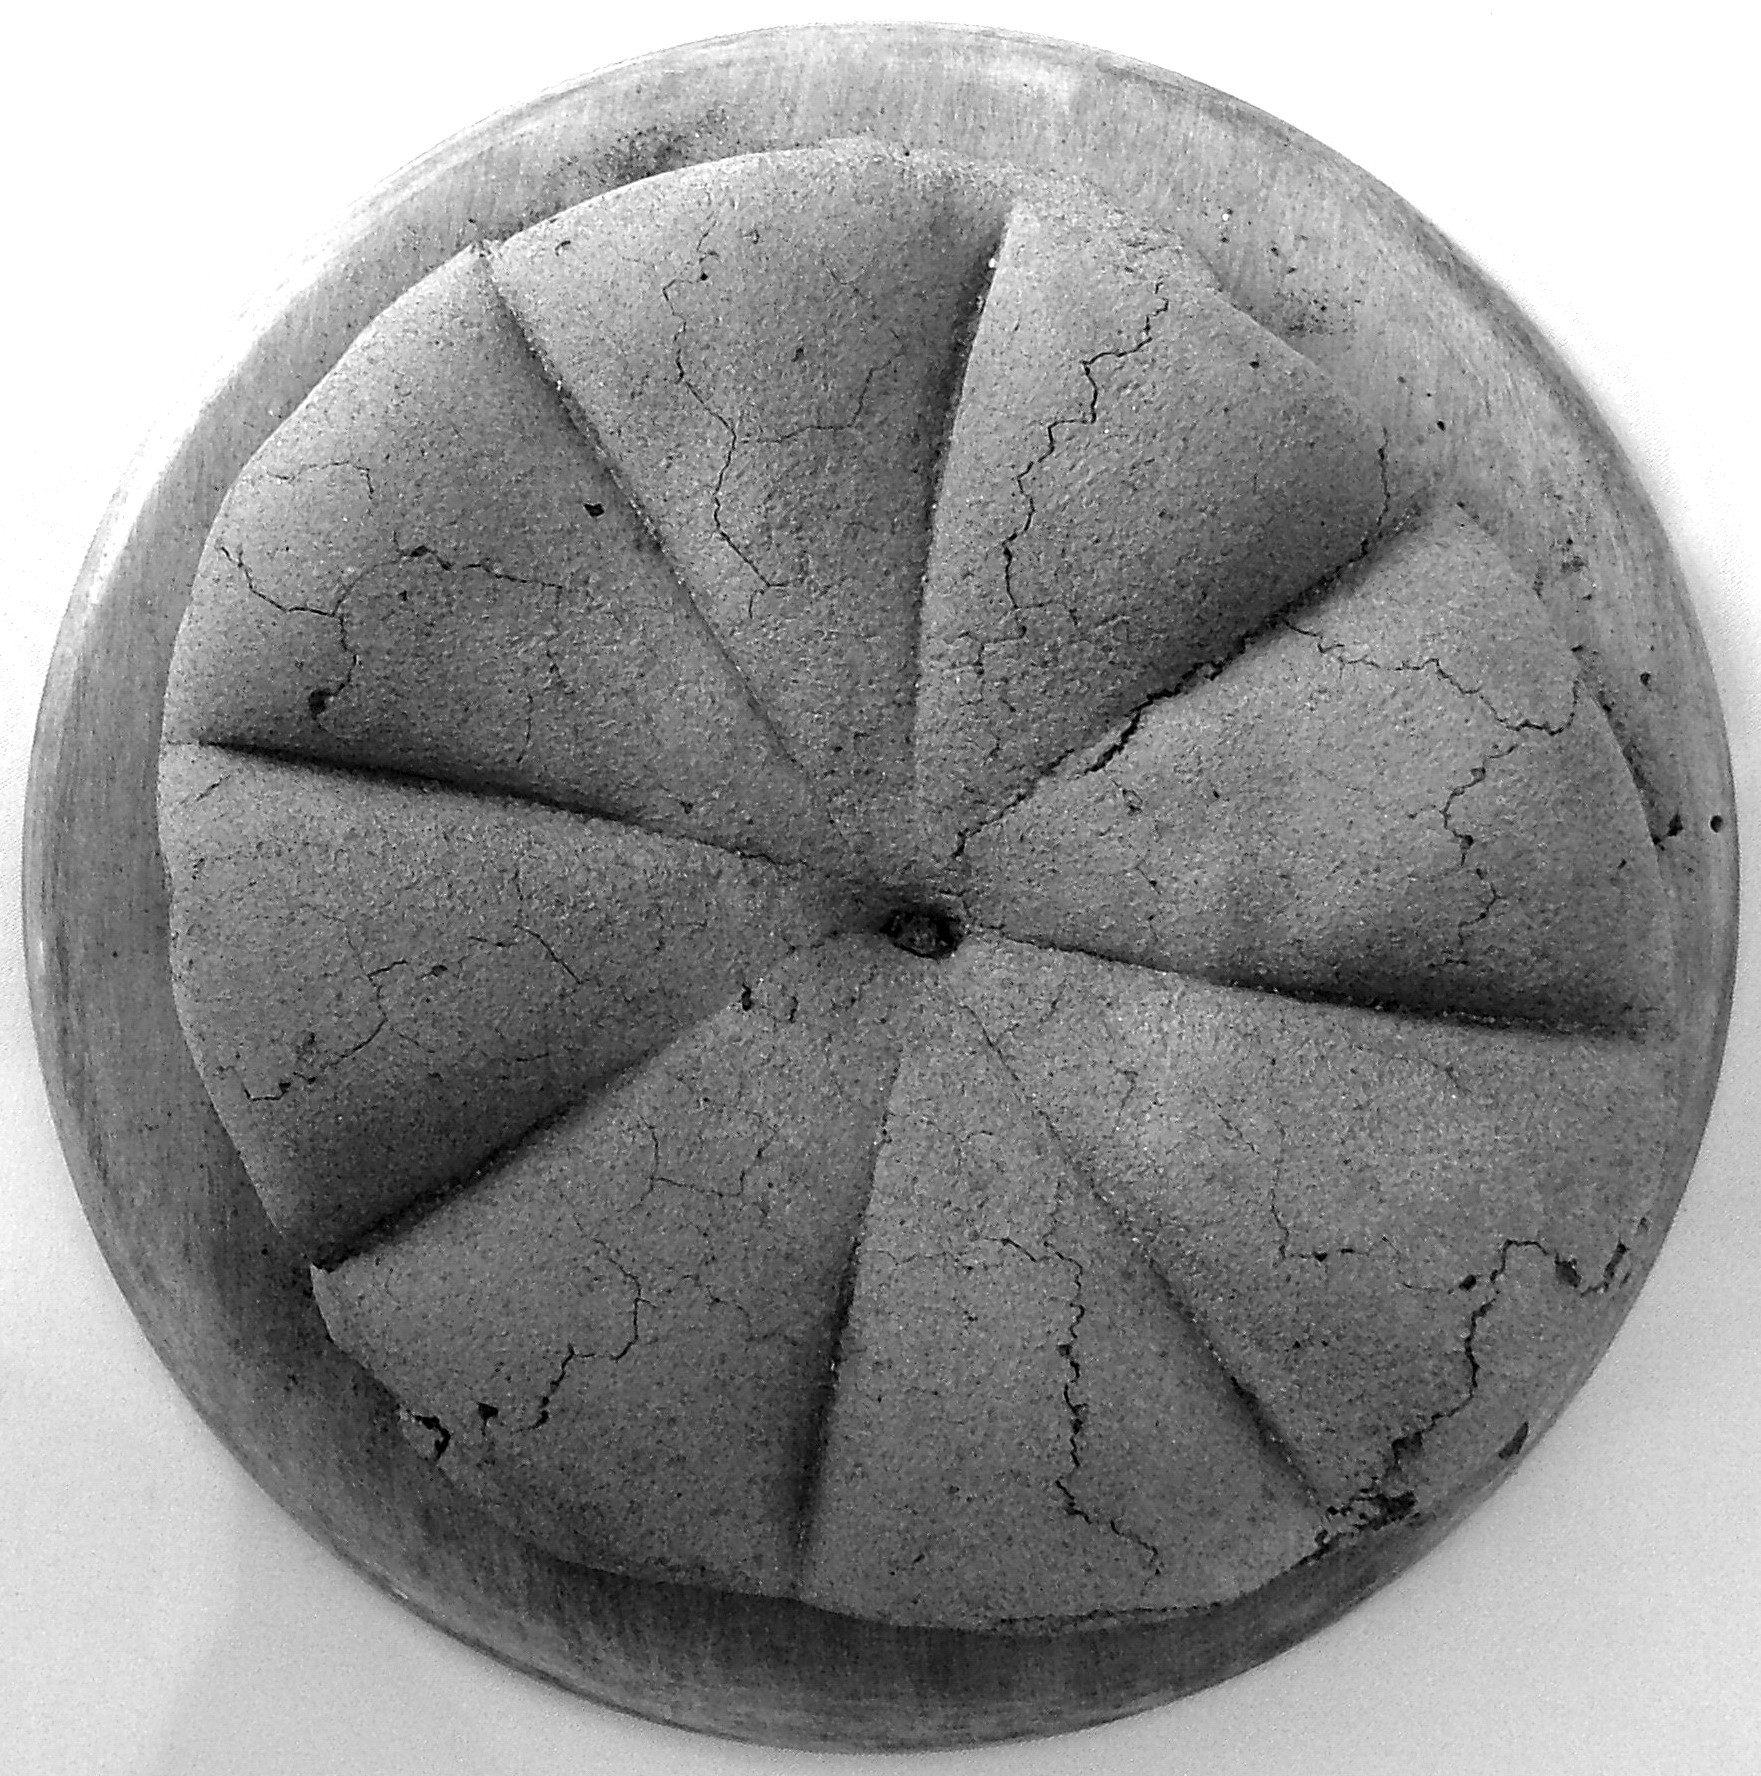 Ancient bread